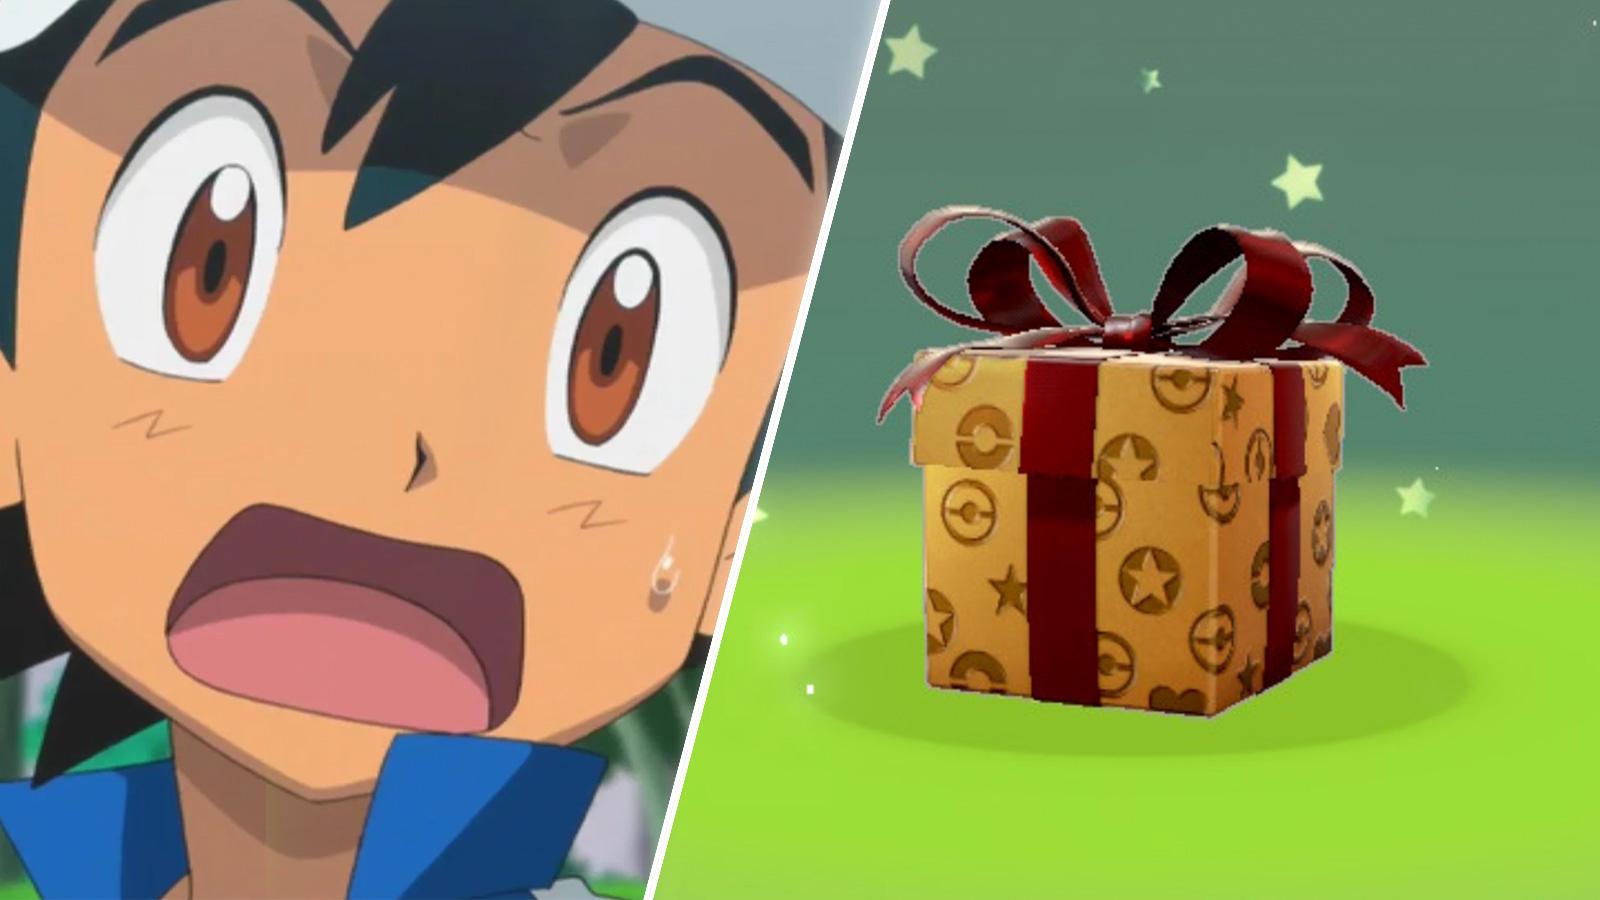 Screenshot Ash Ketchum from Pokemon anime next to Sword & Shield mystery gift.